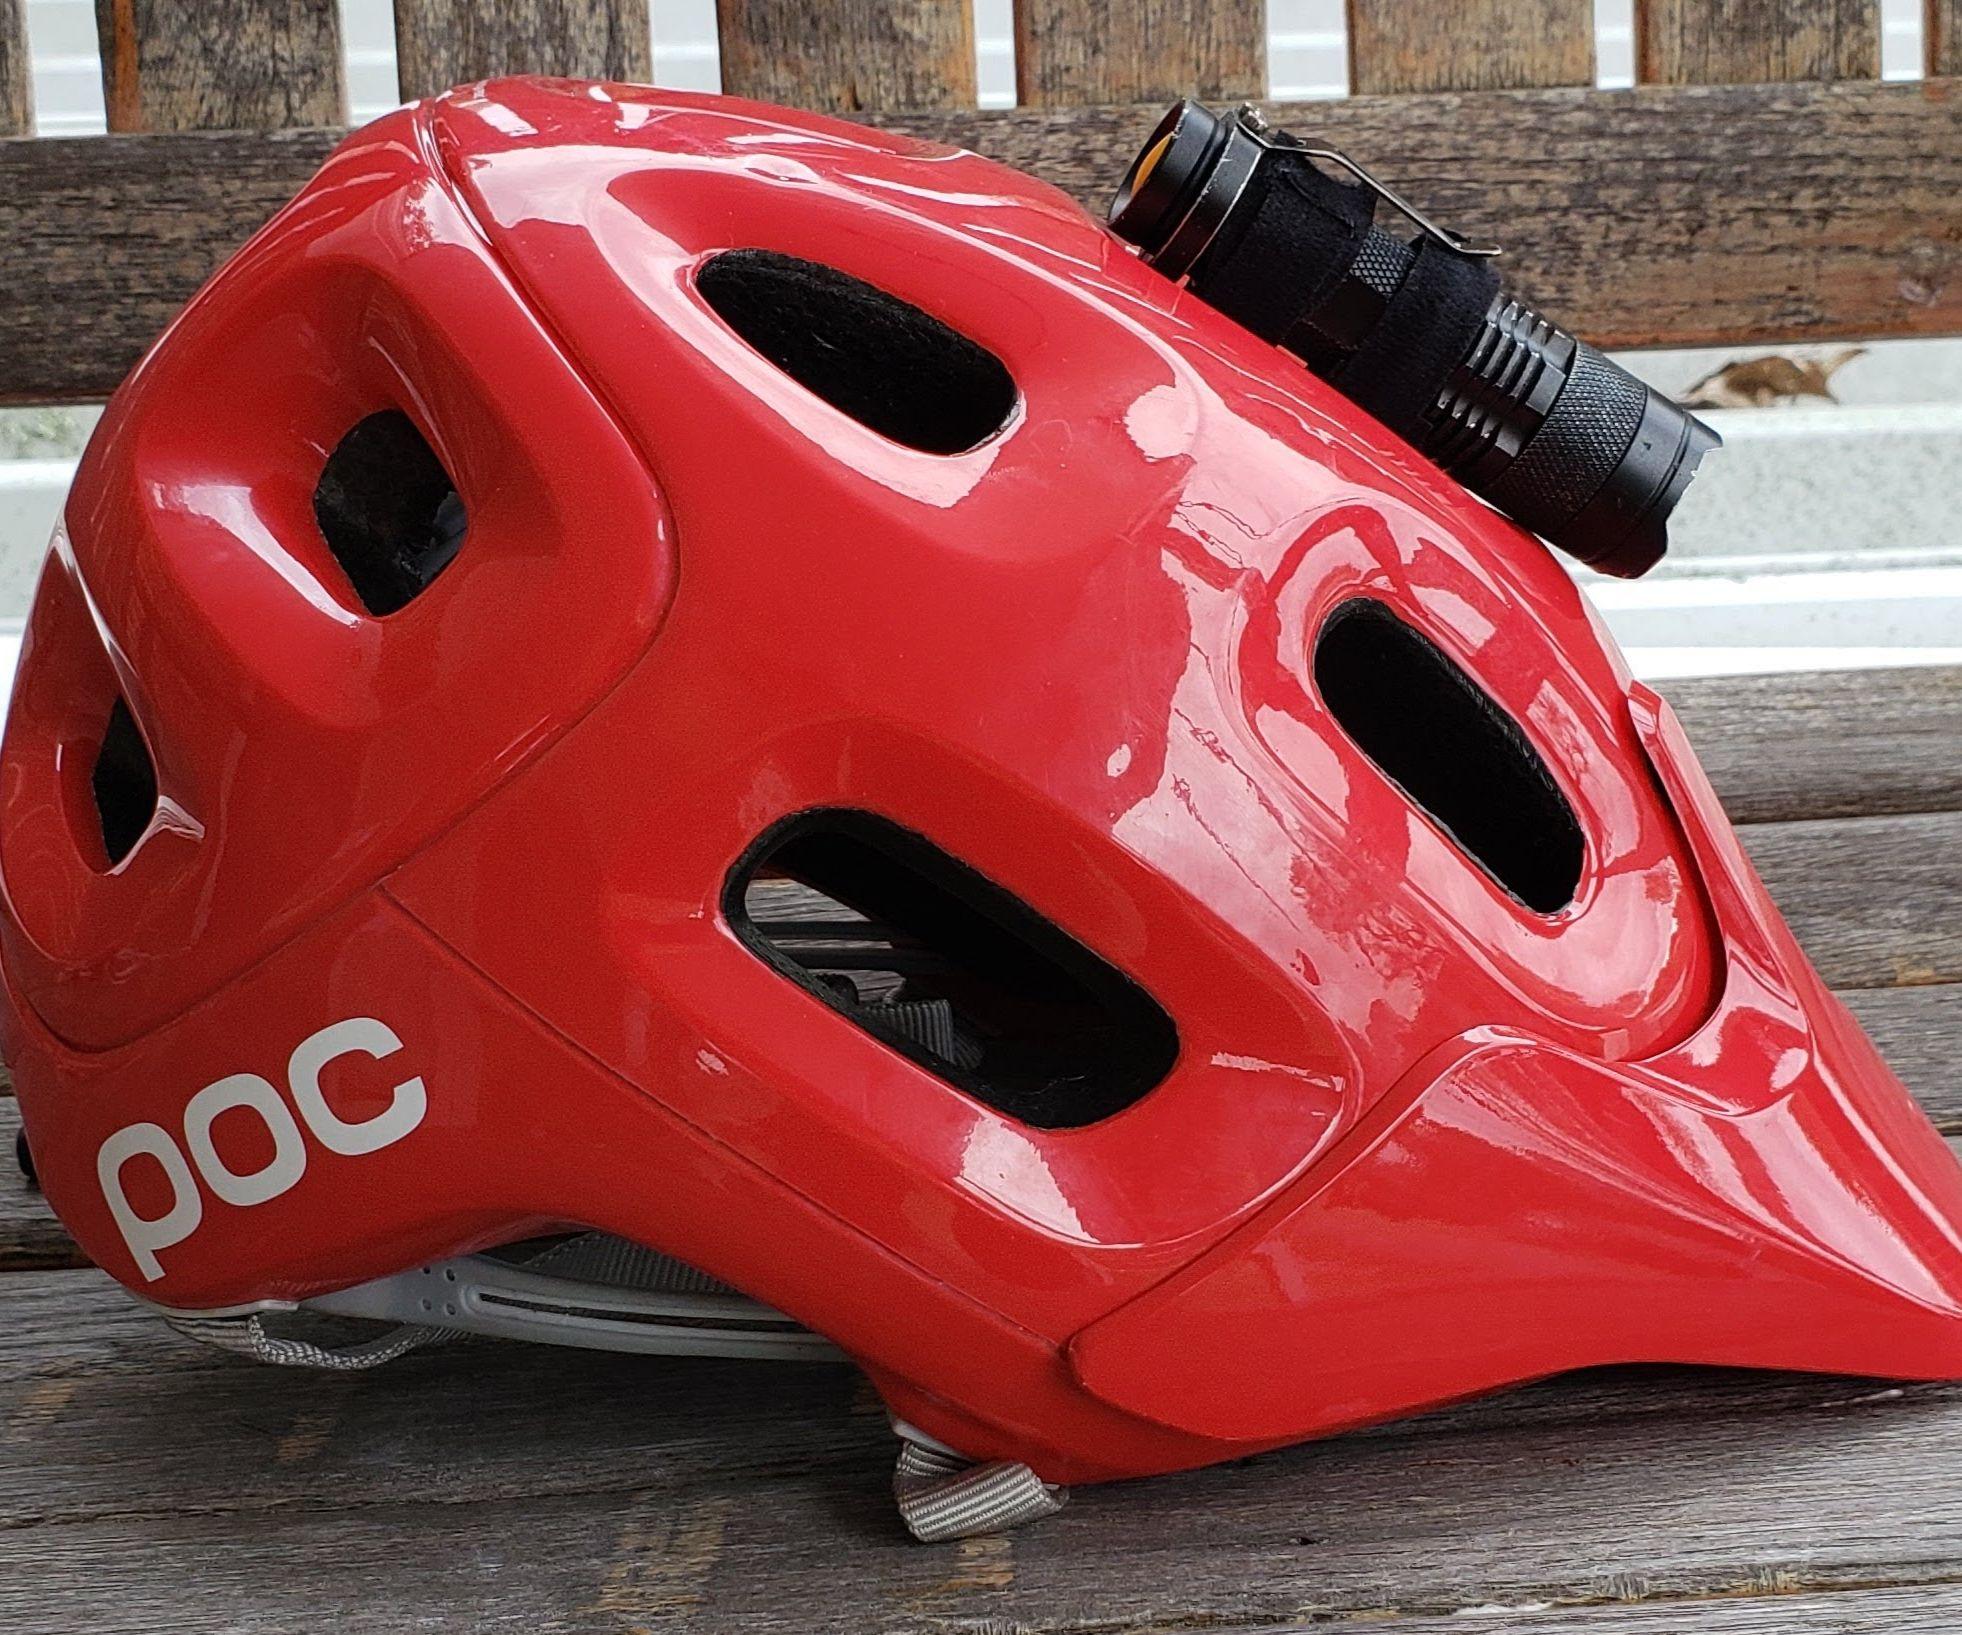 Bicycle Helmet Light Mount